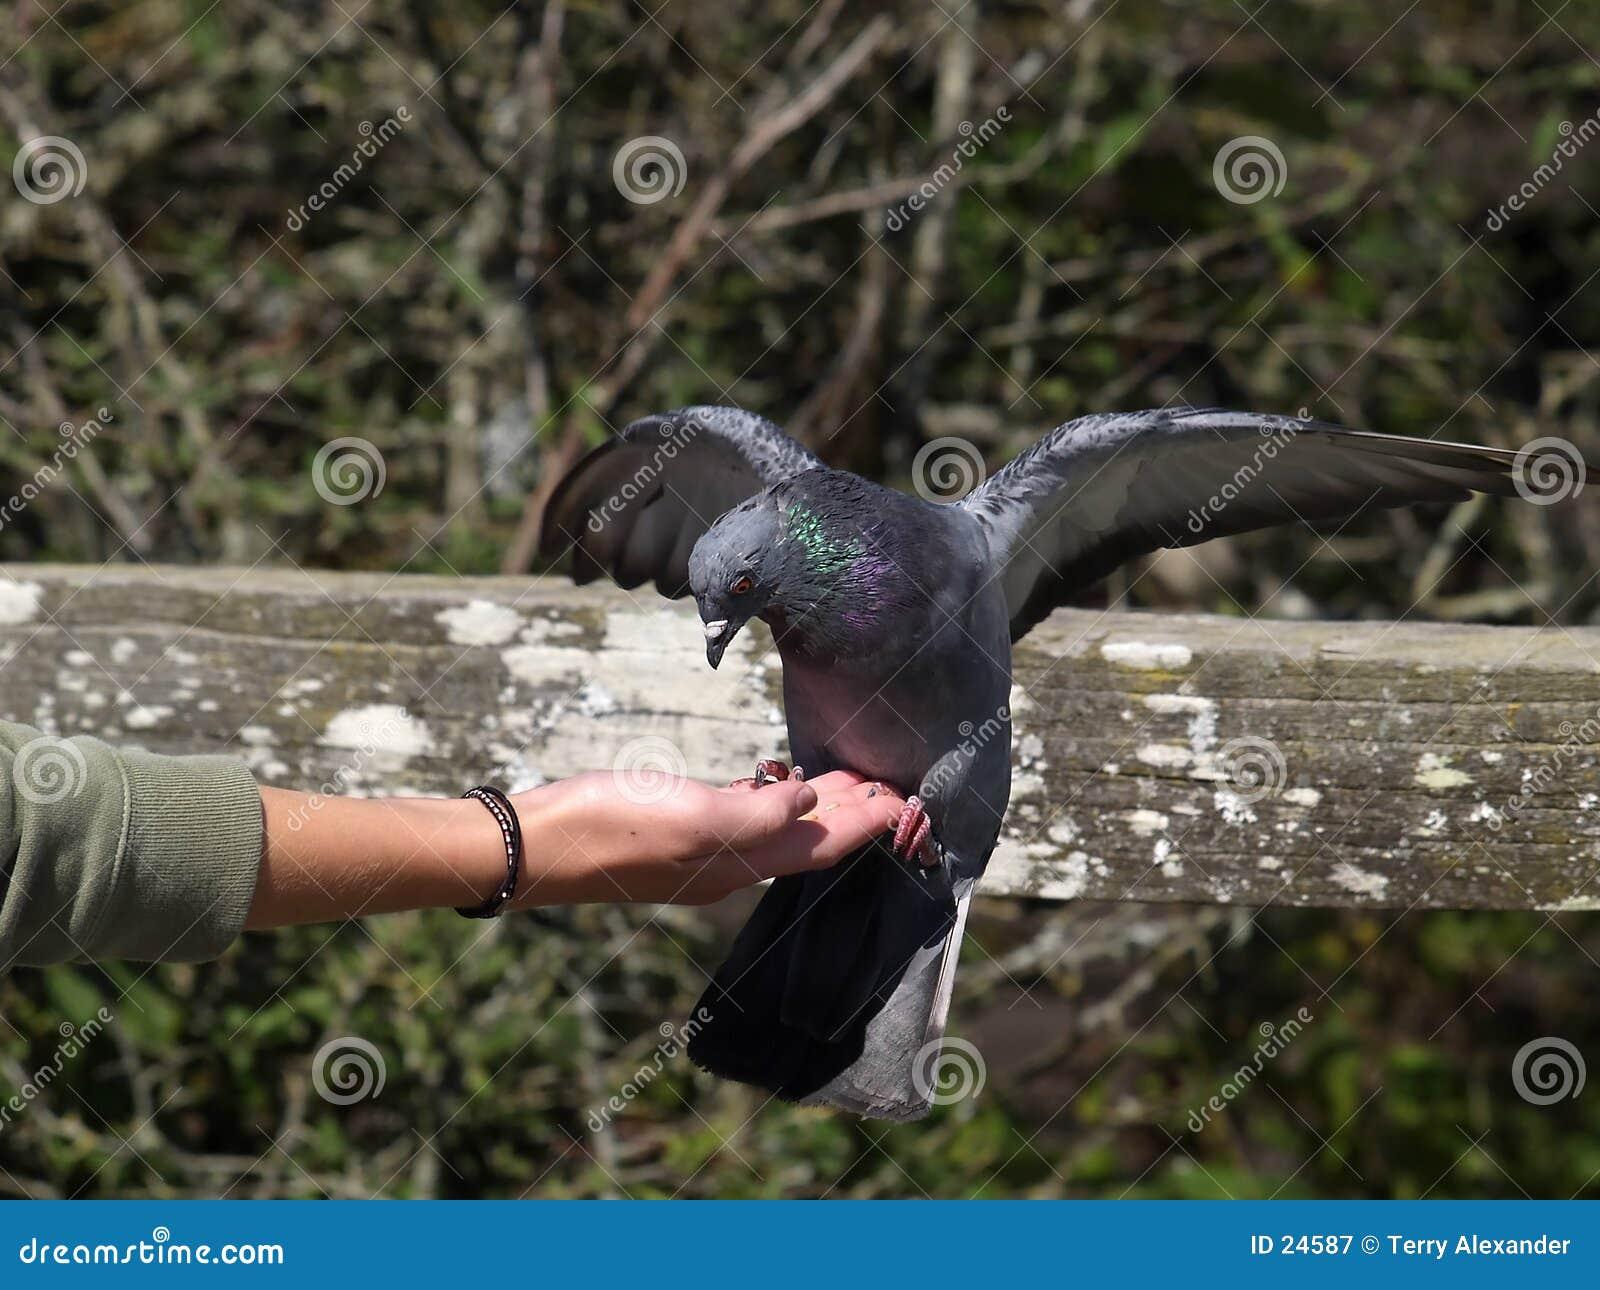 Feeding Pigeon II